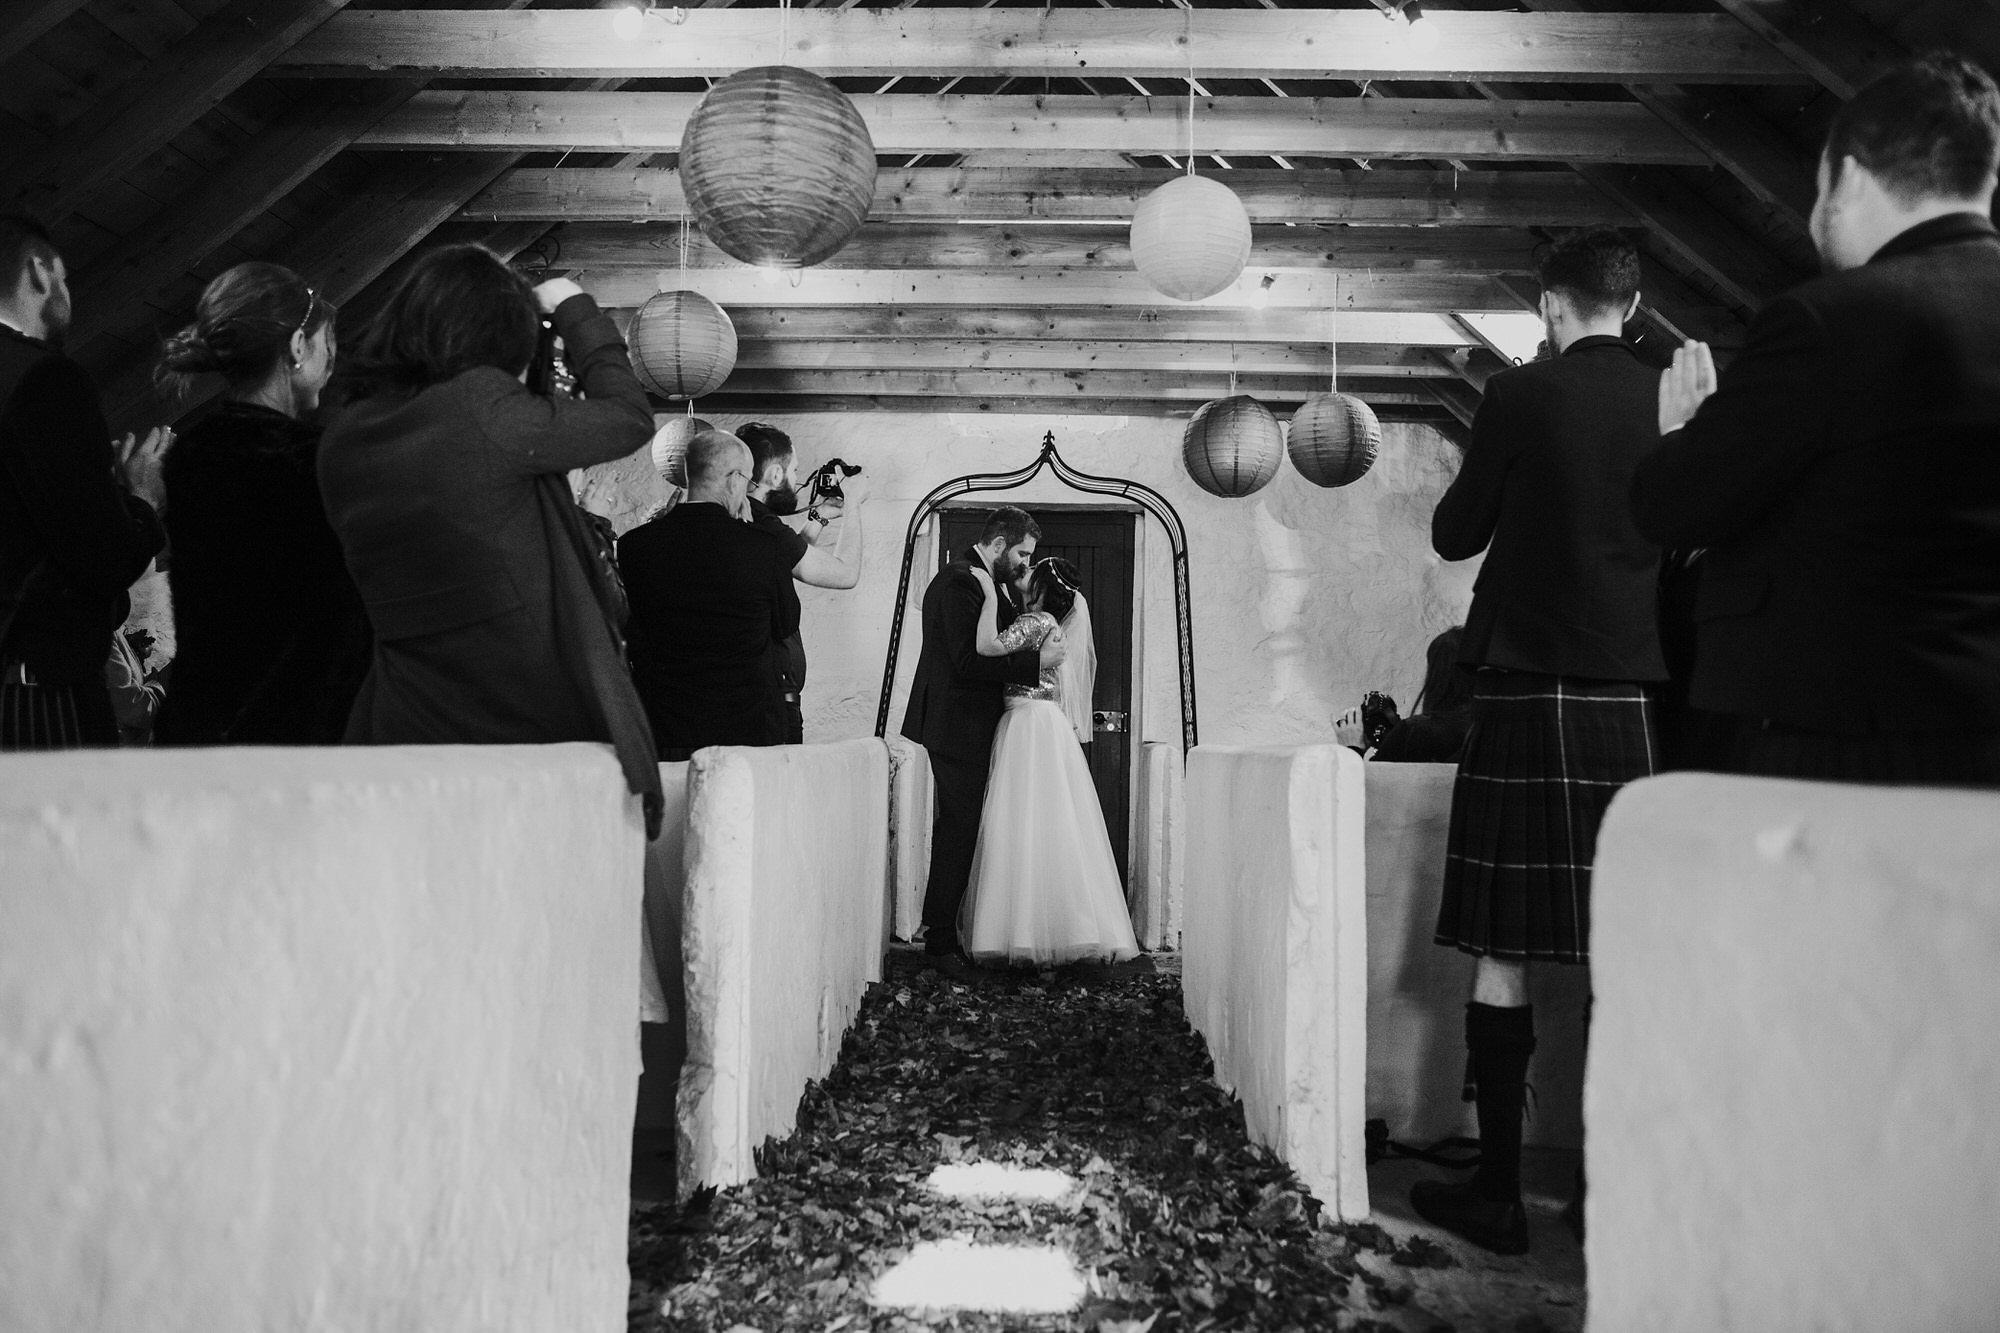 029 TIN SHED KNOCKRAICH FARM WEDDING ALTERNATIVE BRIDE ZOE ALEXANDRA PHOTOGRAPHY